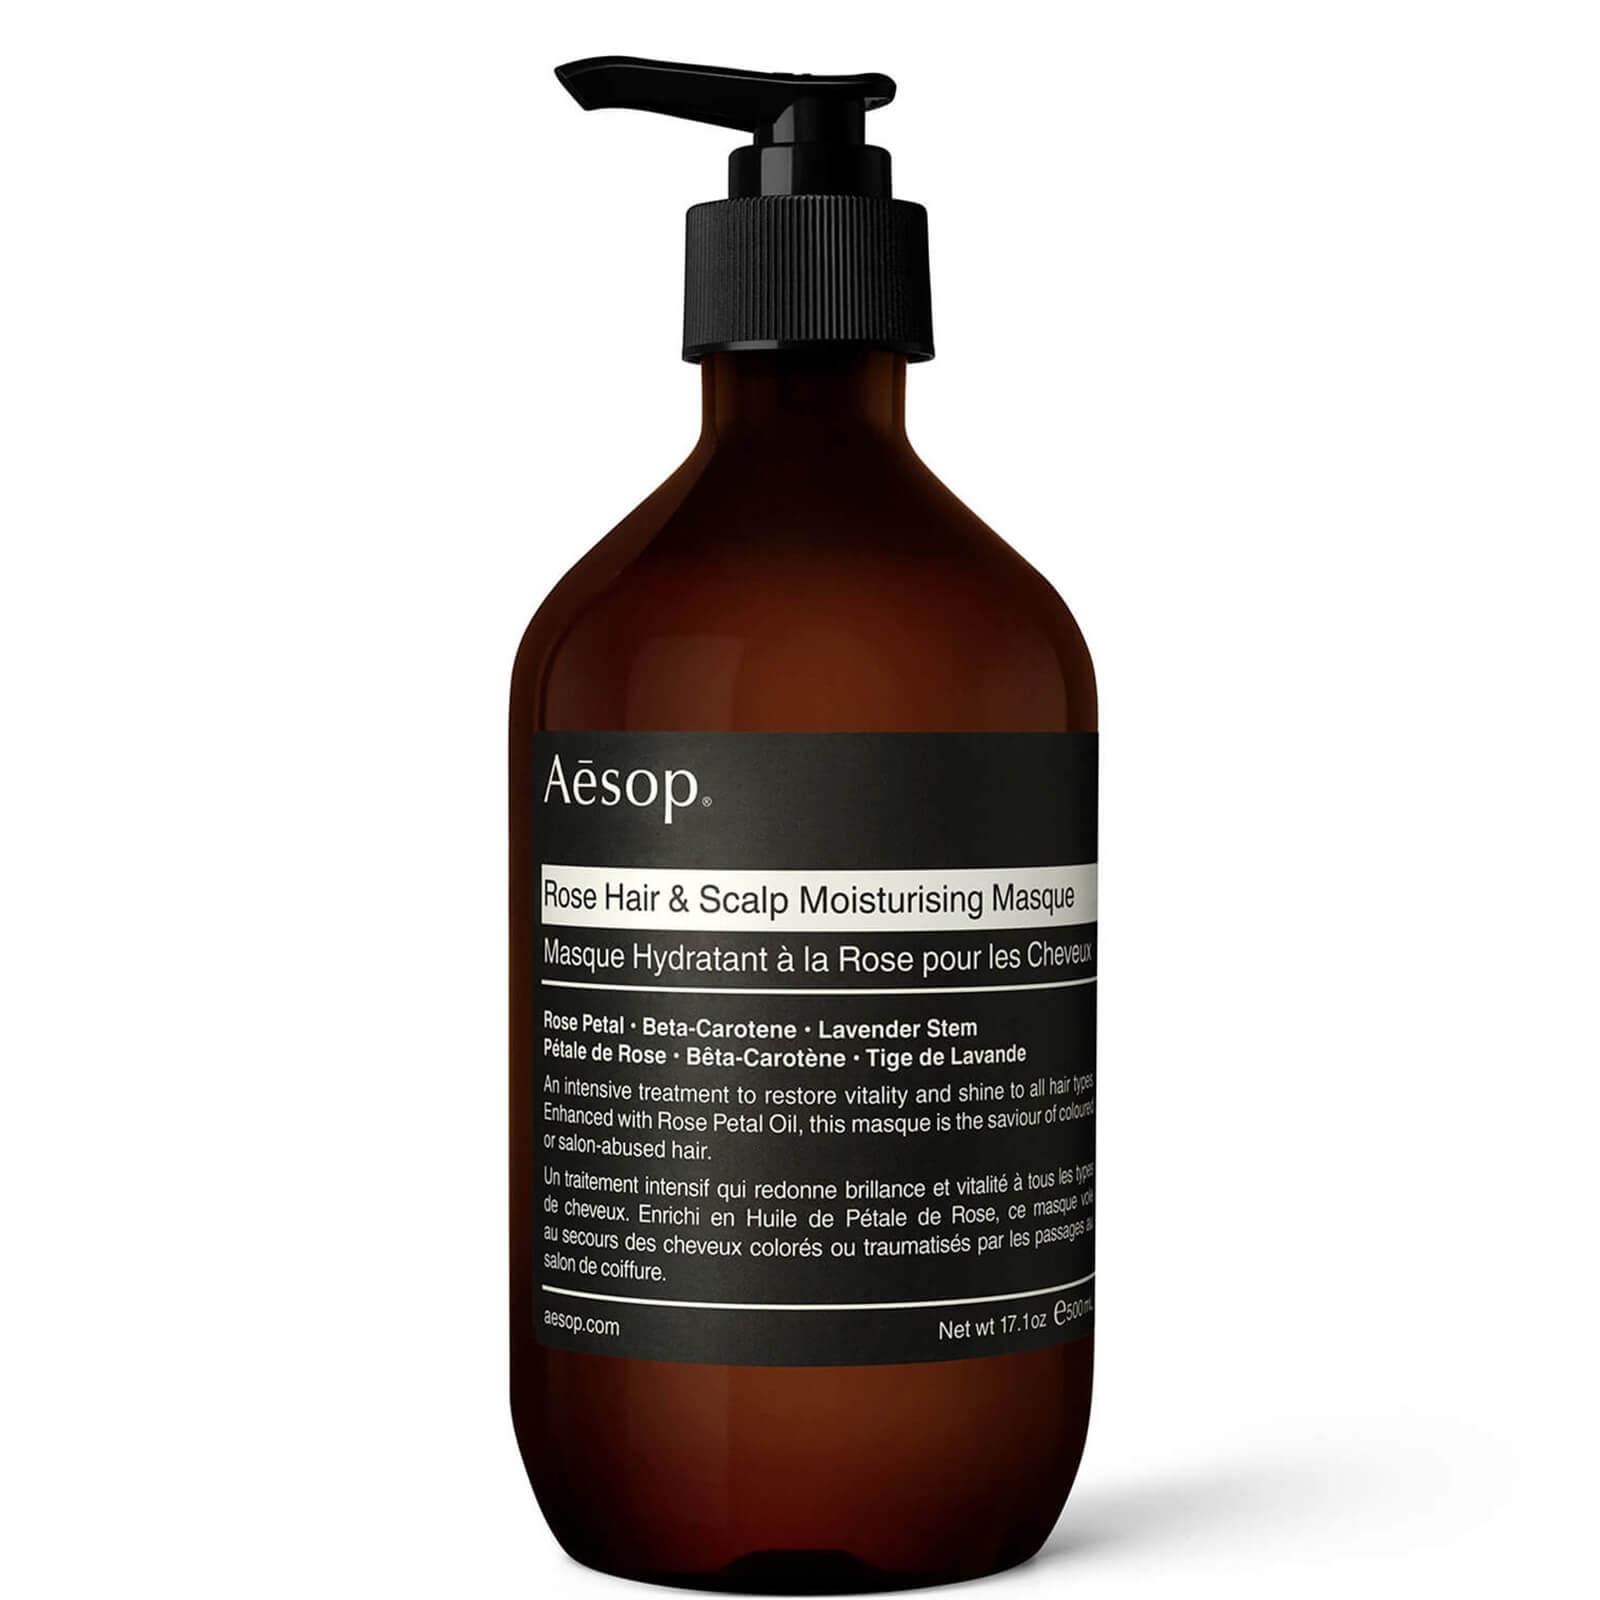 Купить Aesop Rose Hair and Scalp Moisturising Masque 500ml